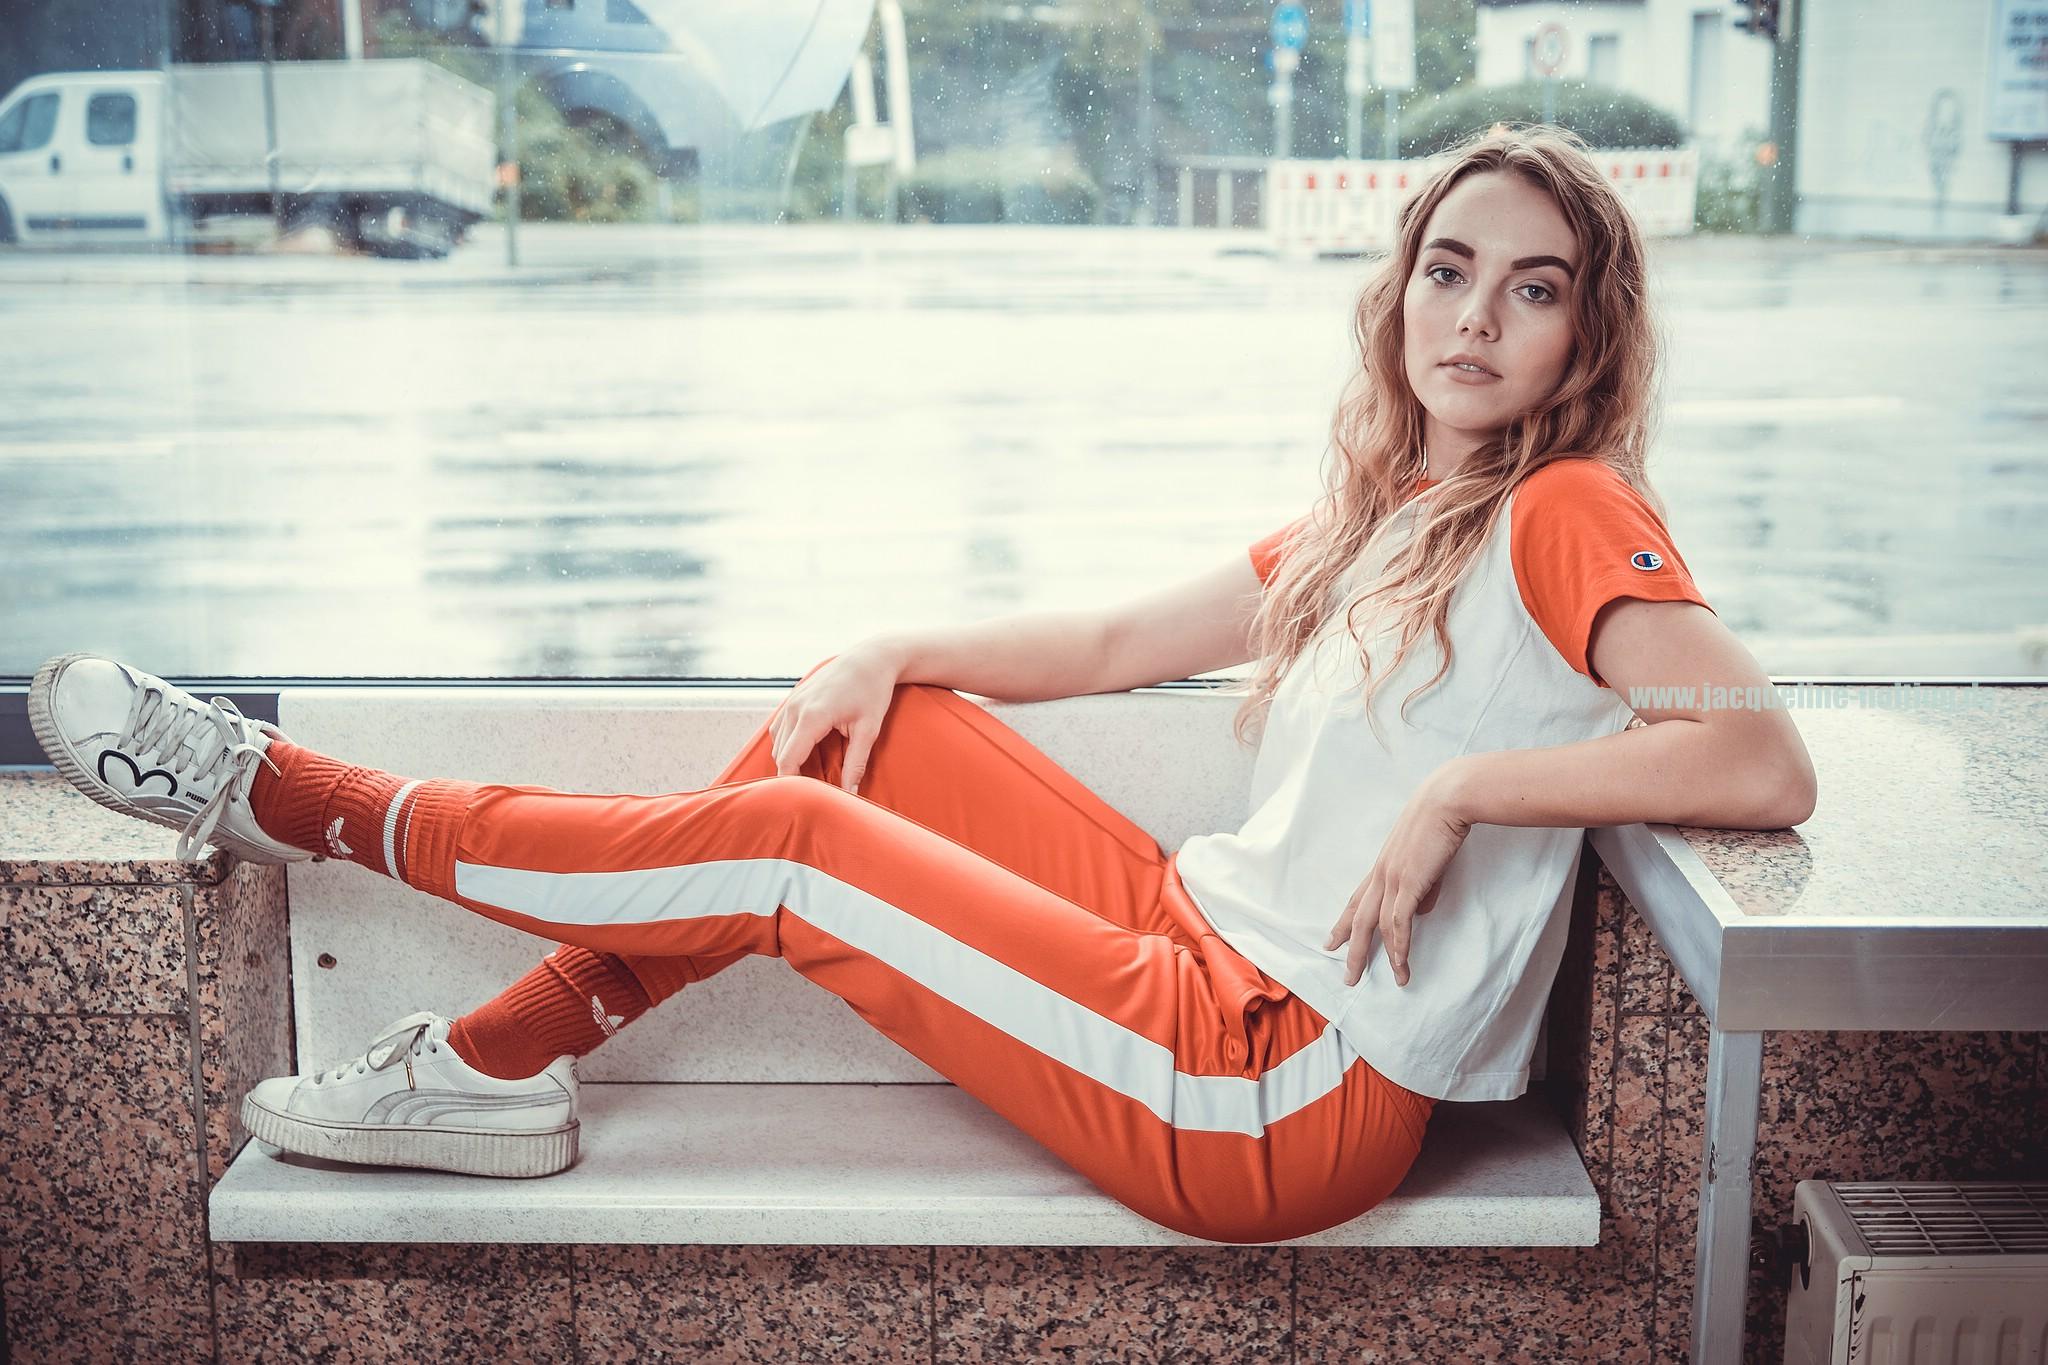 Fussballerin Sophia Thiemann